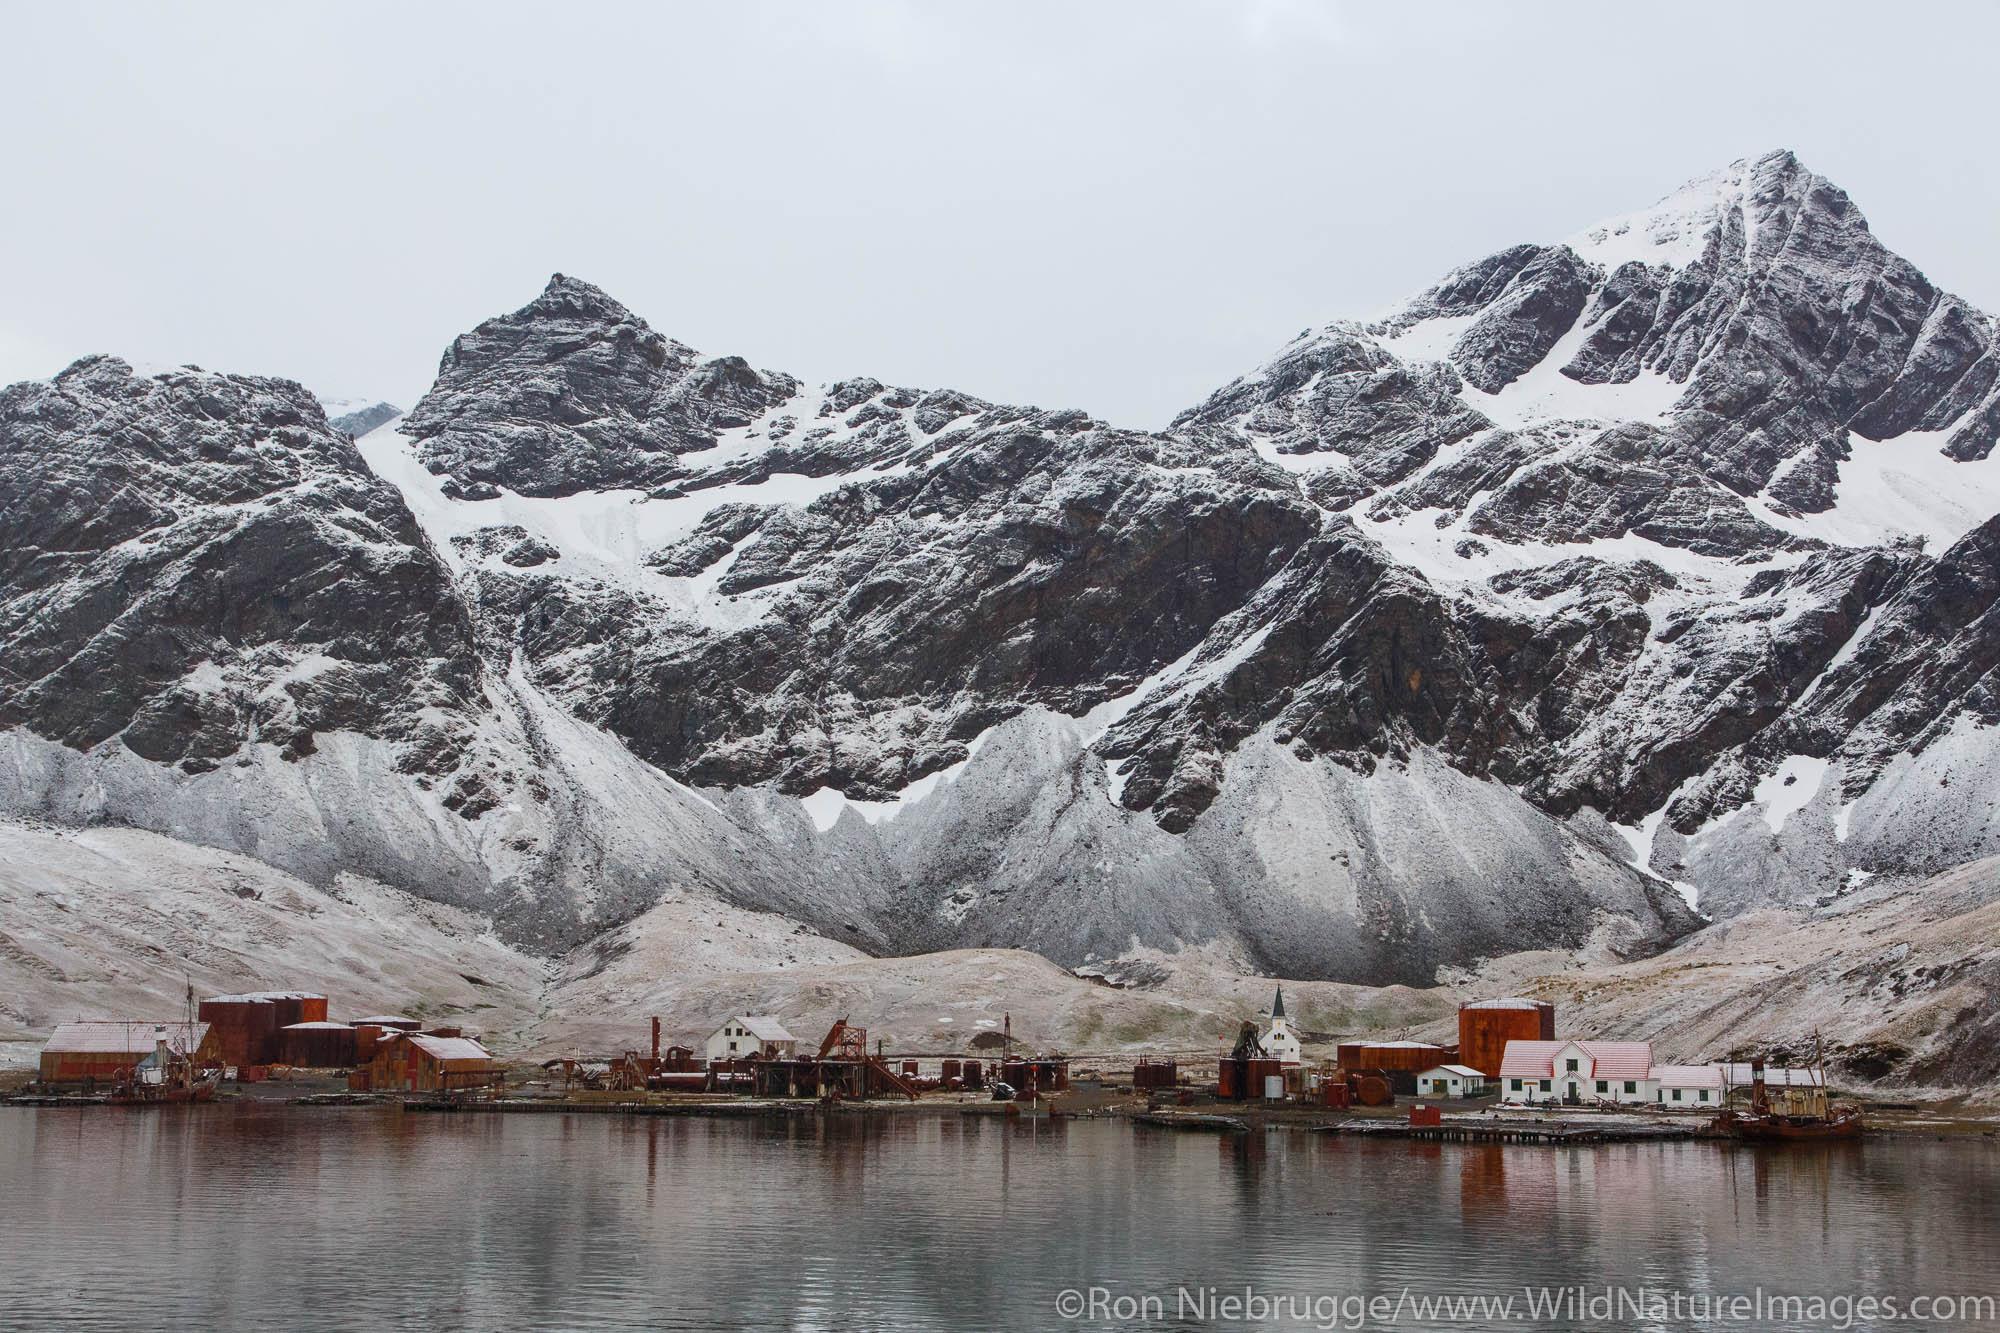 Historic whaling station of Grytviken, South Georgia, Antarctica.